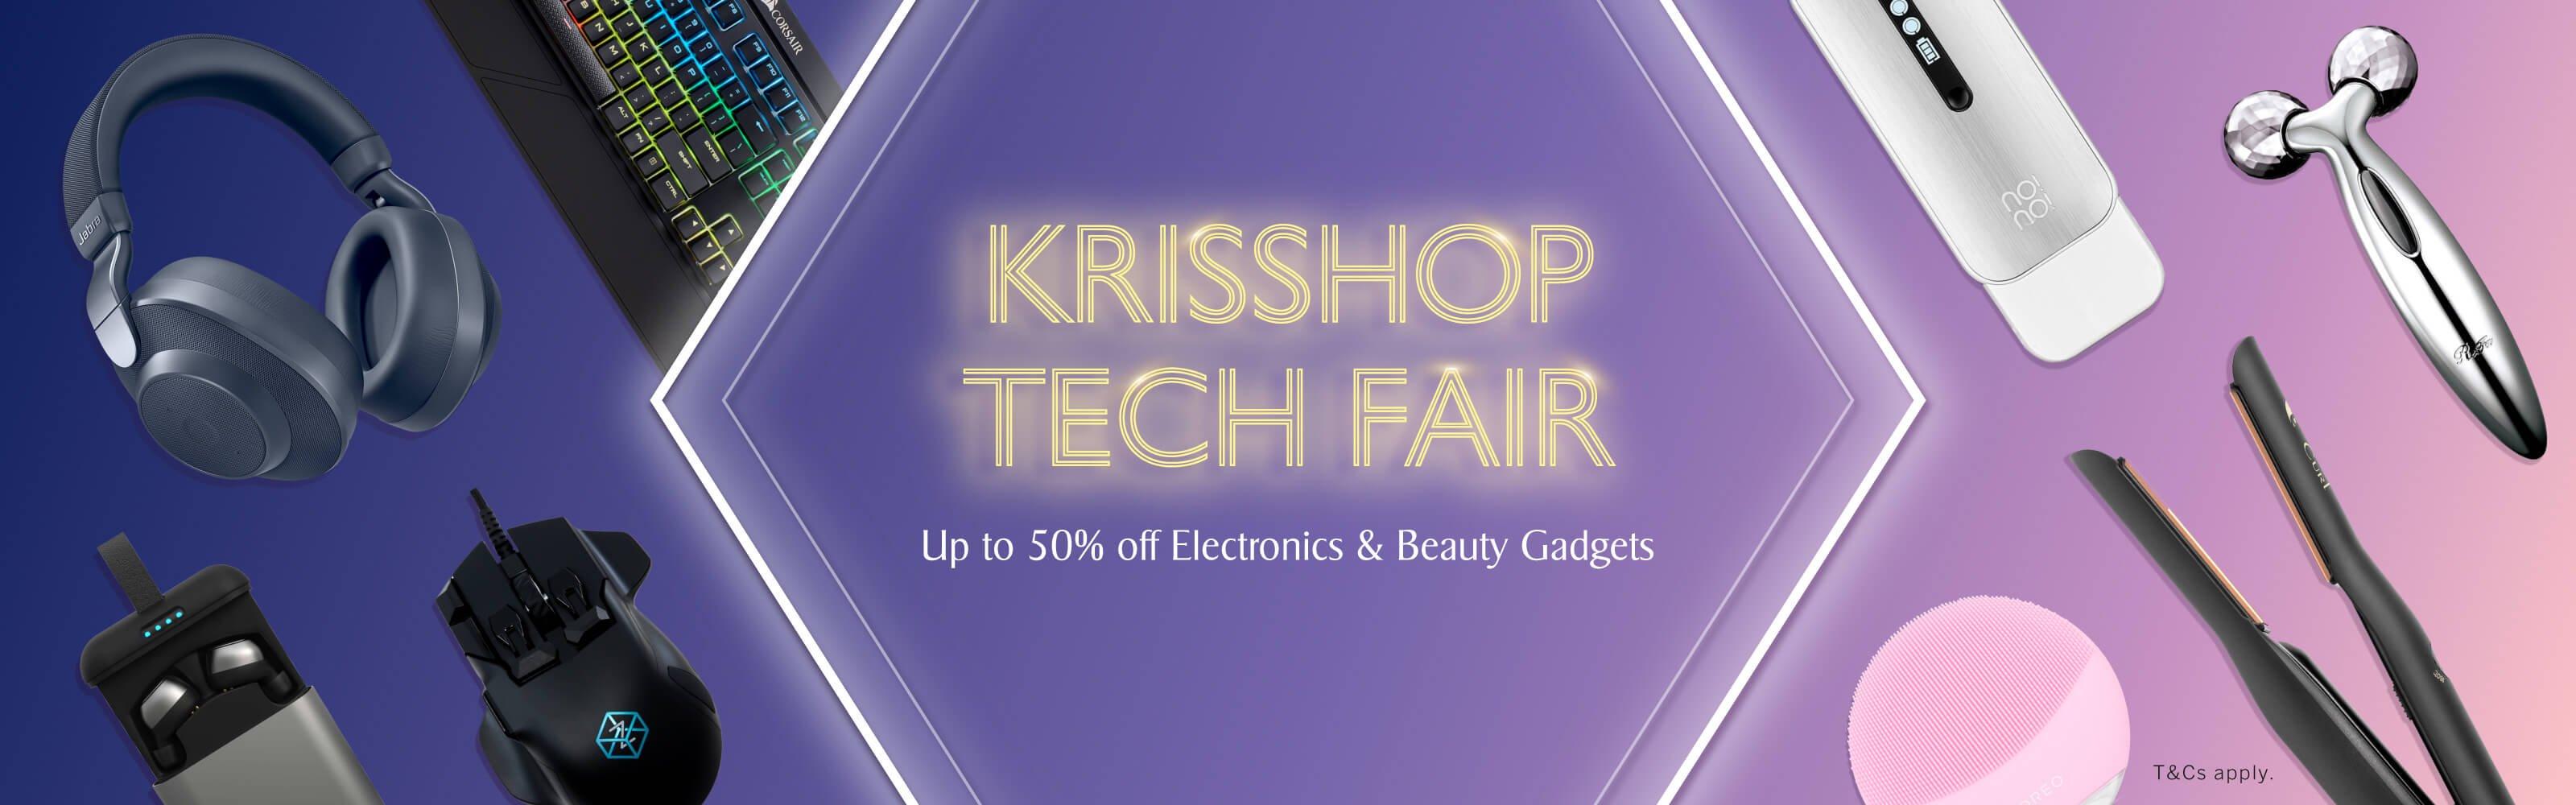 KrisShop Tech Fair 2020